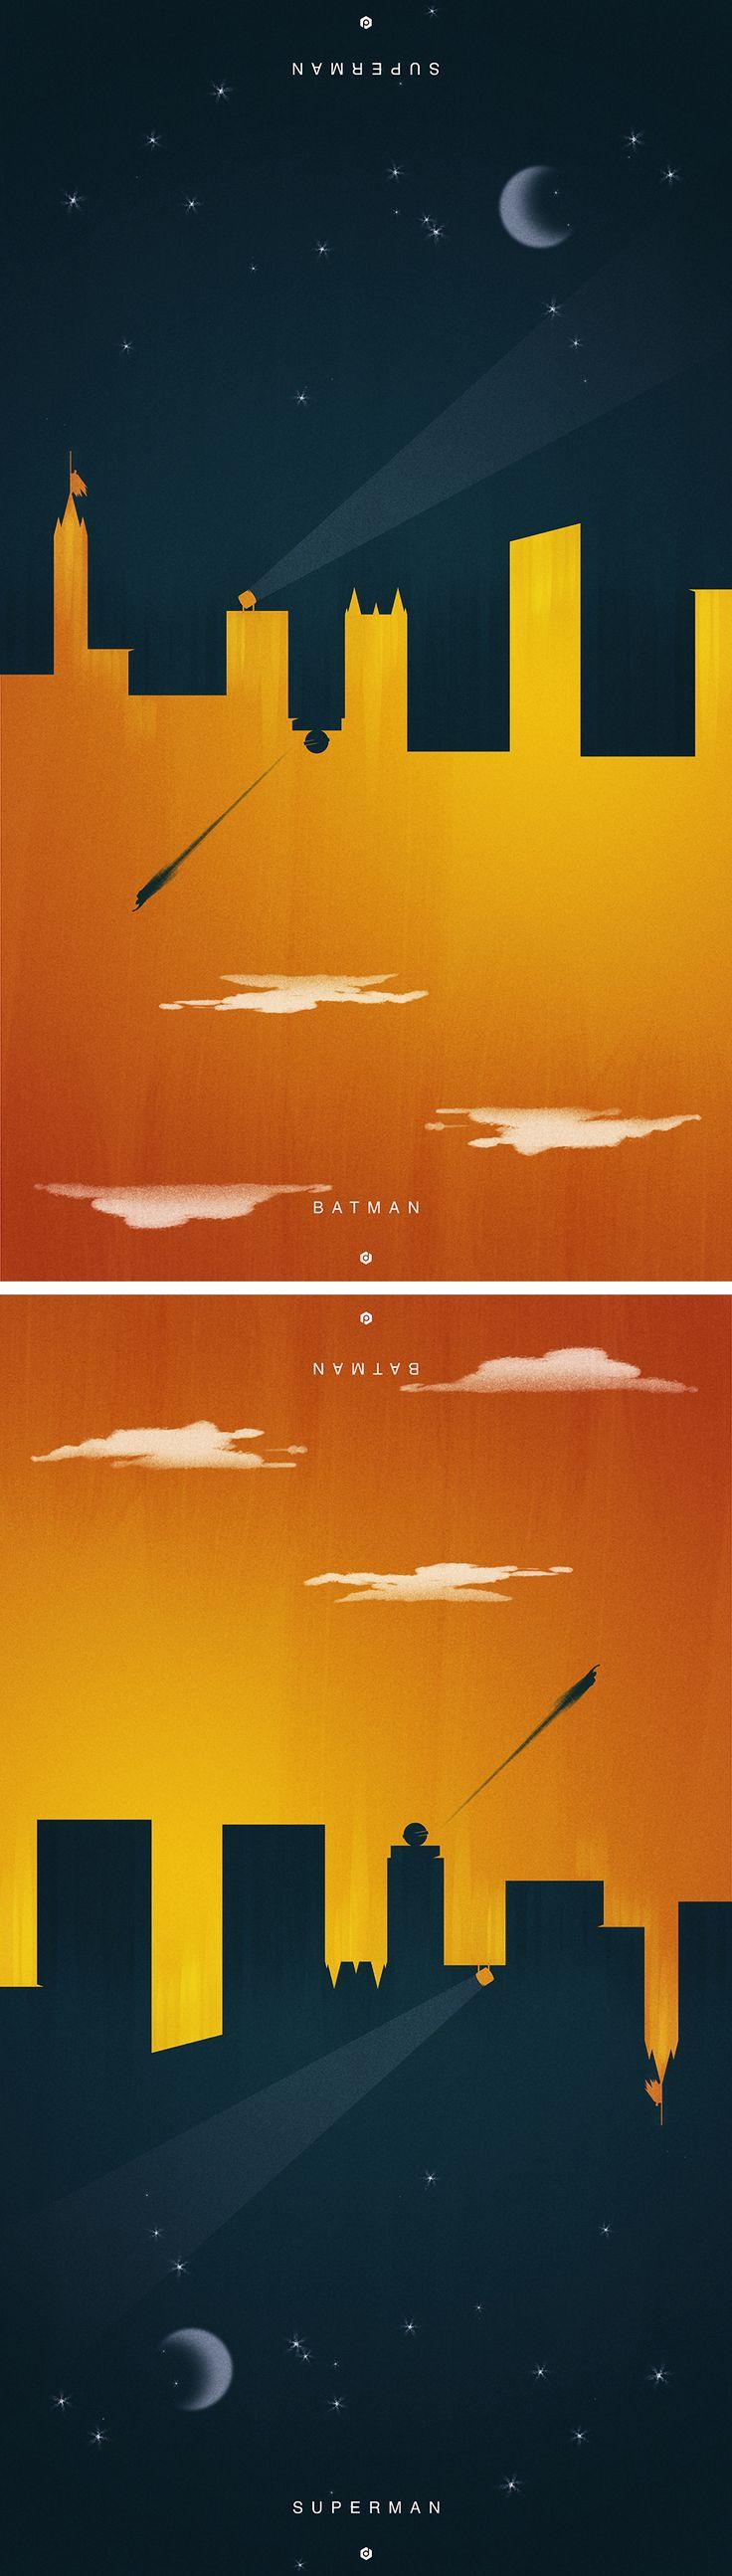 Dual Batman Vs. Superman Negative Space Art Poster - http://designerburst.com/dual-batman-vs-superman-art-poster/